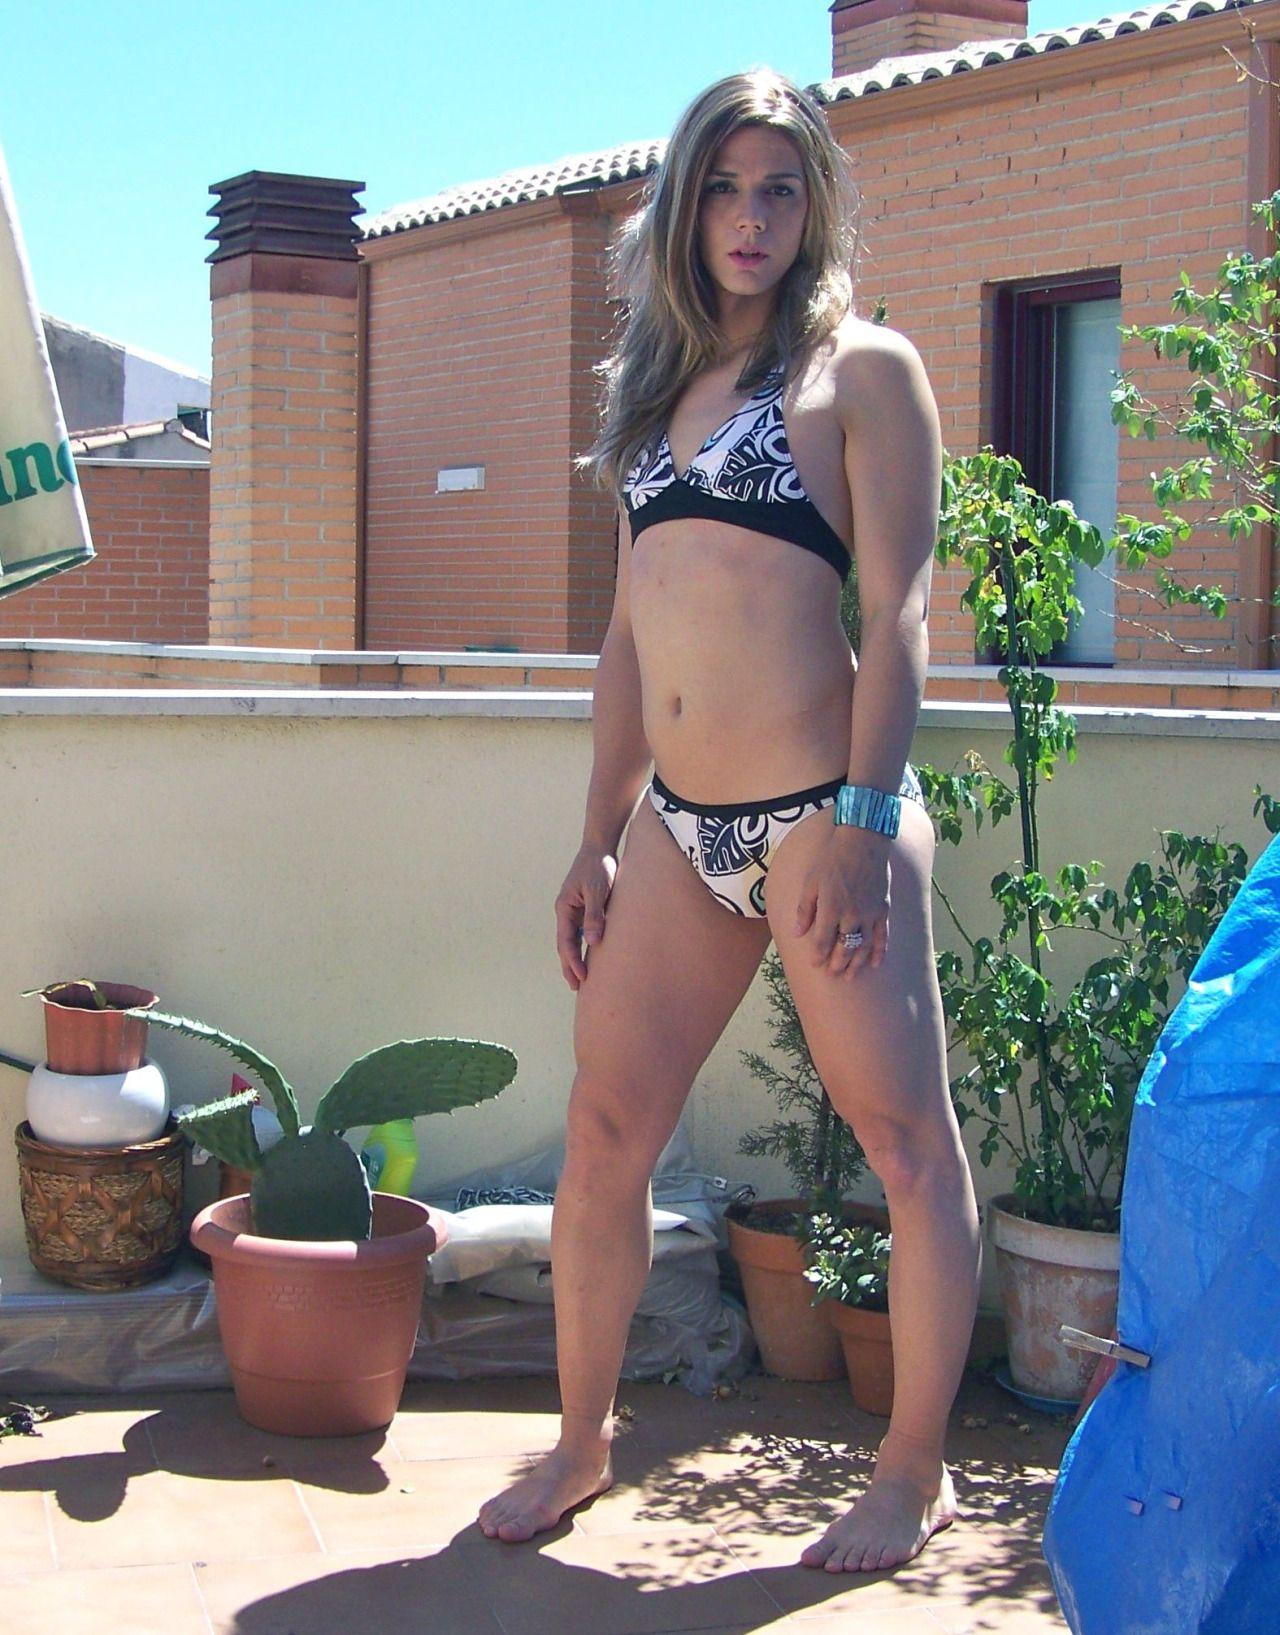 a Transvestite bikini wearing